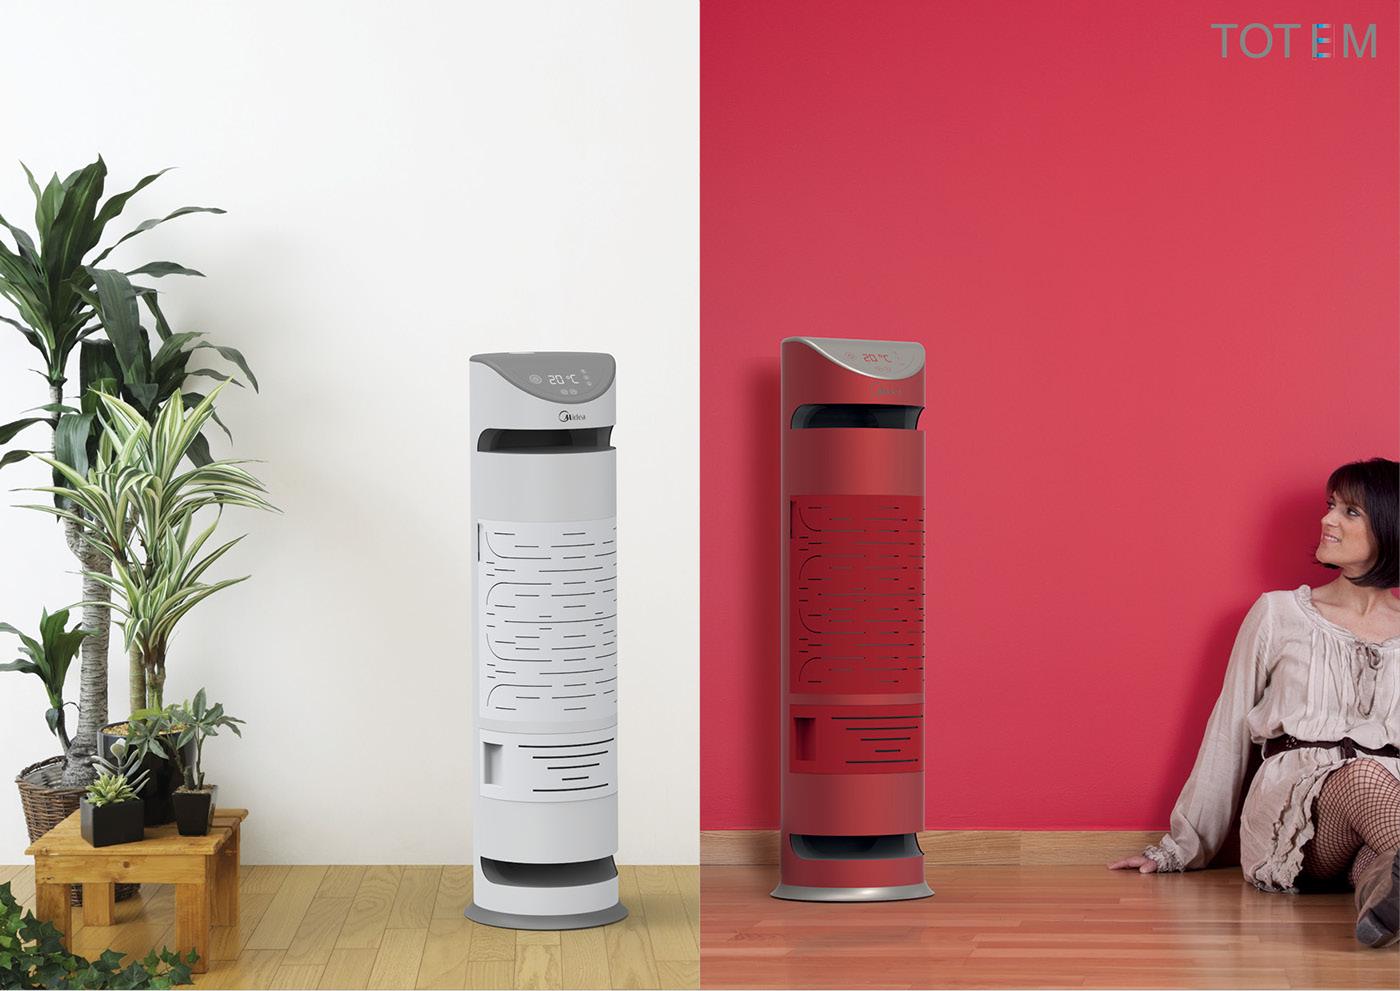 Air conditioner Midea politecnico di milano electrodomestic Stand FLOOR Design and Engineering